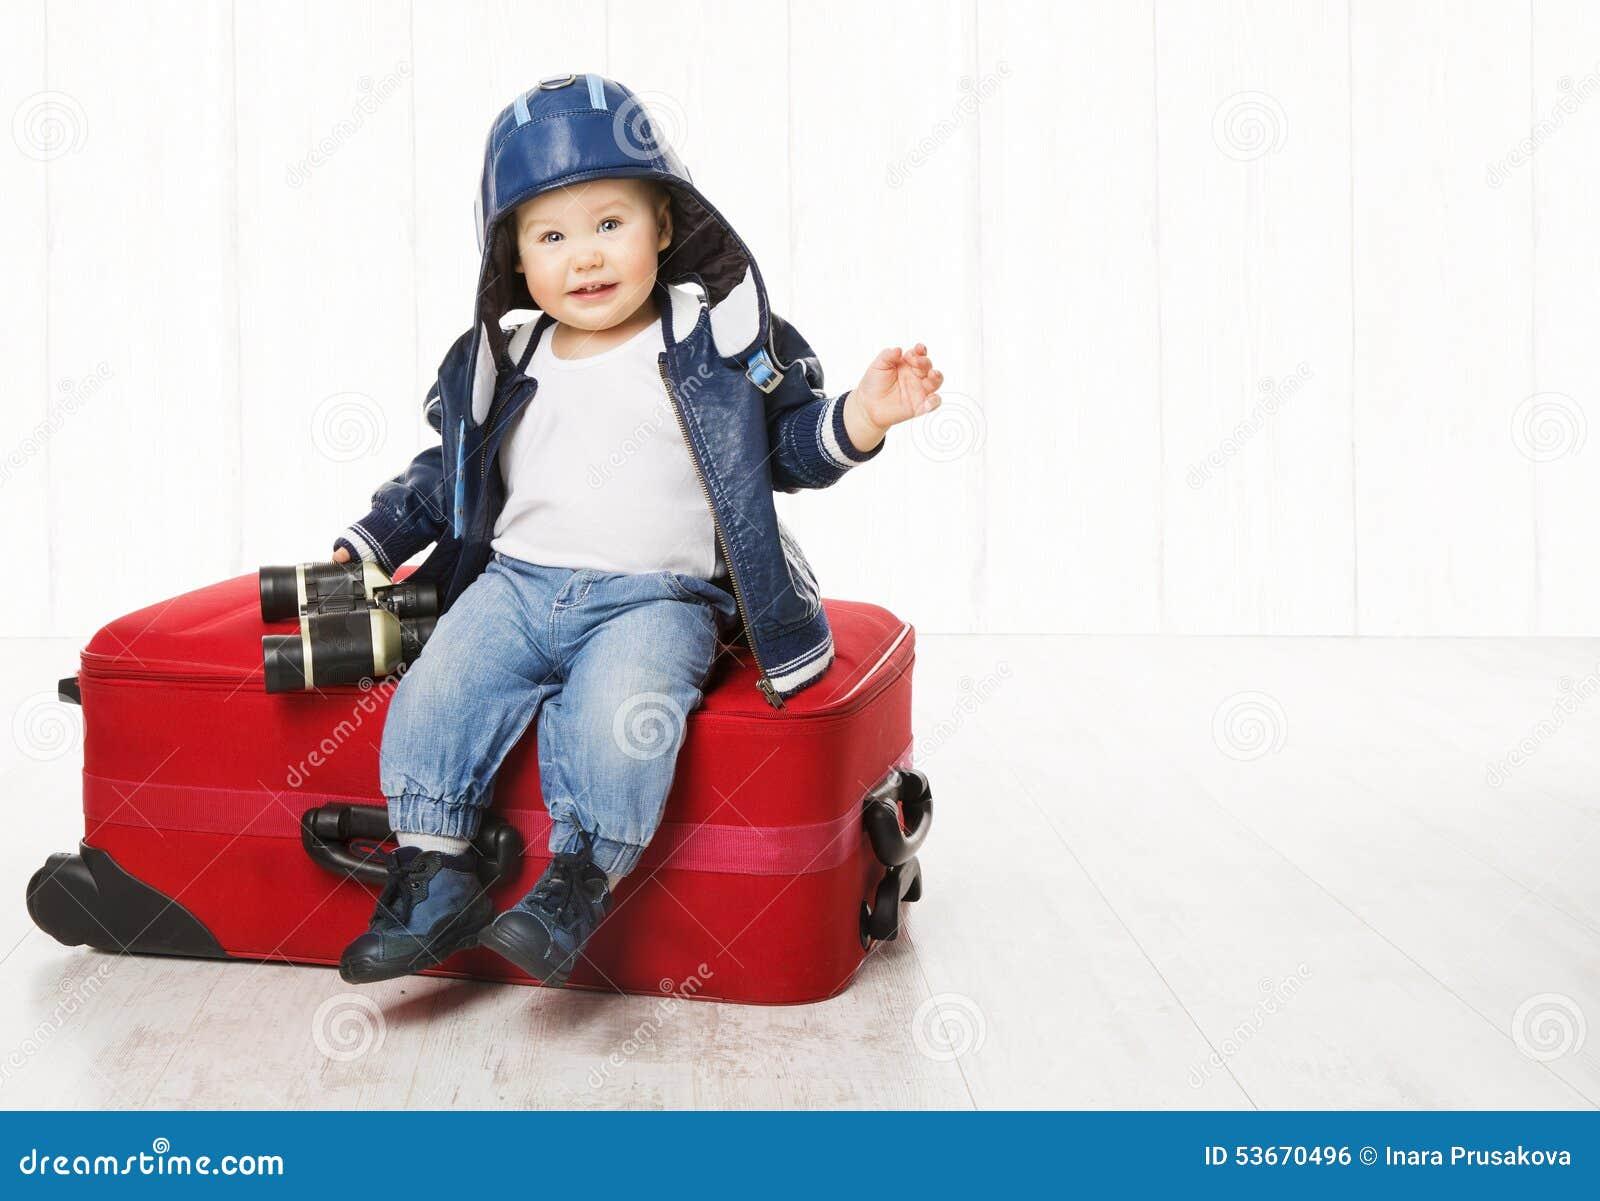 Baby and Suitcase, Kid Luggage, Child Boy Leather Jacket Helmet